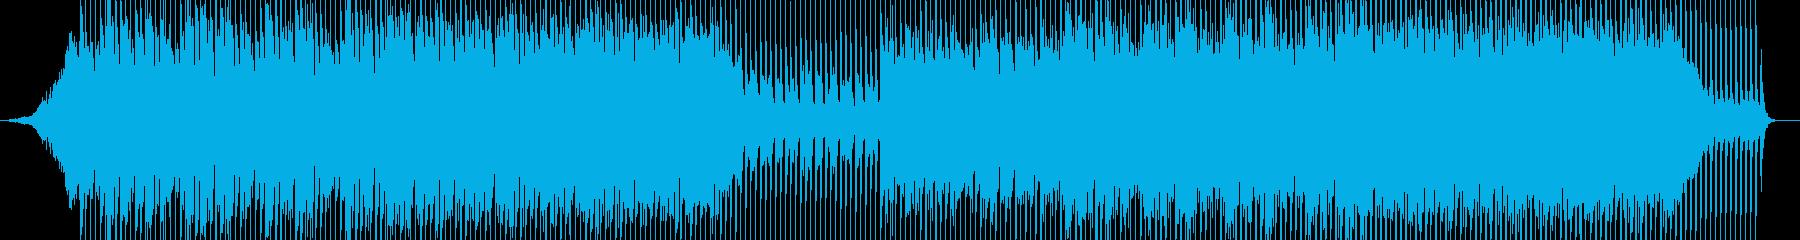 EDMポップで明るいクラブ系-47の再生済みの波形